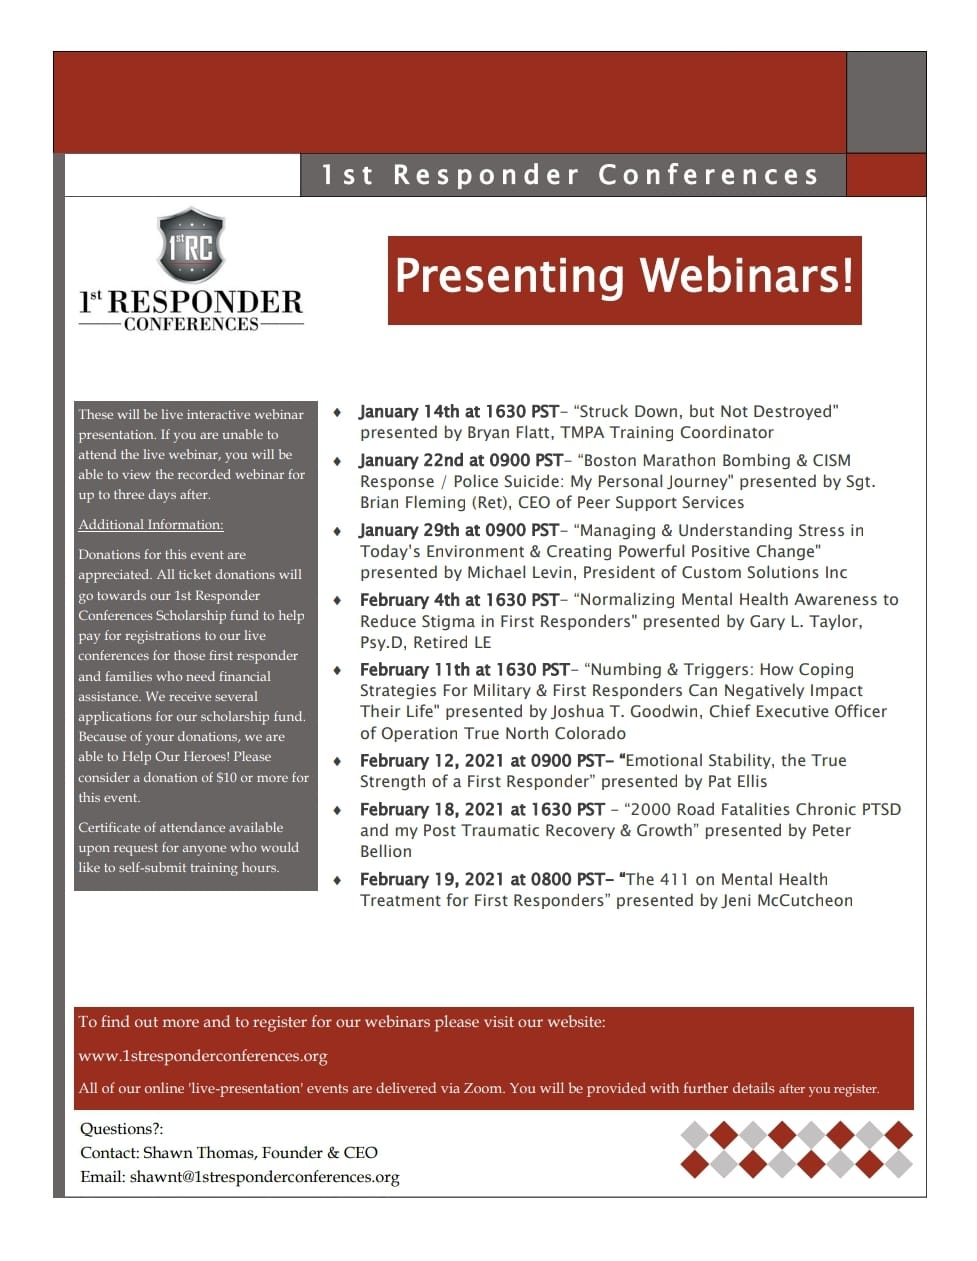 1st Responder Conferences